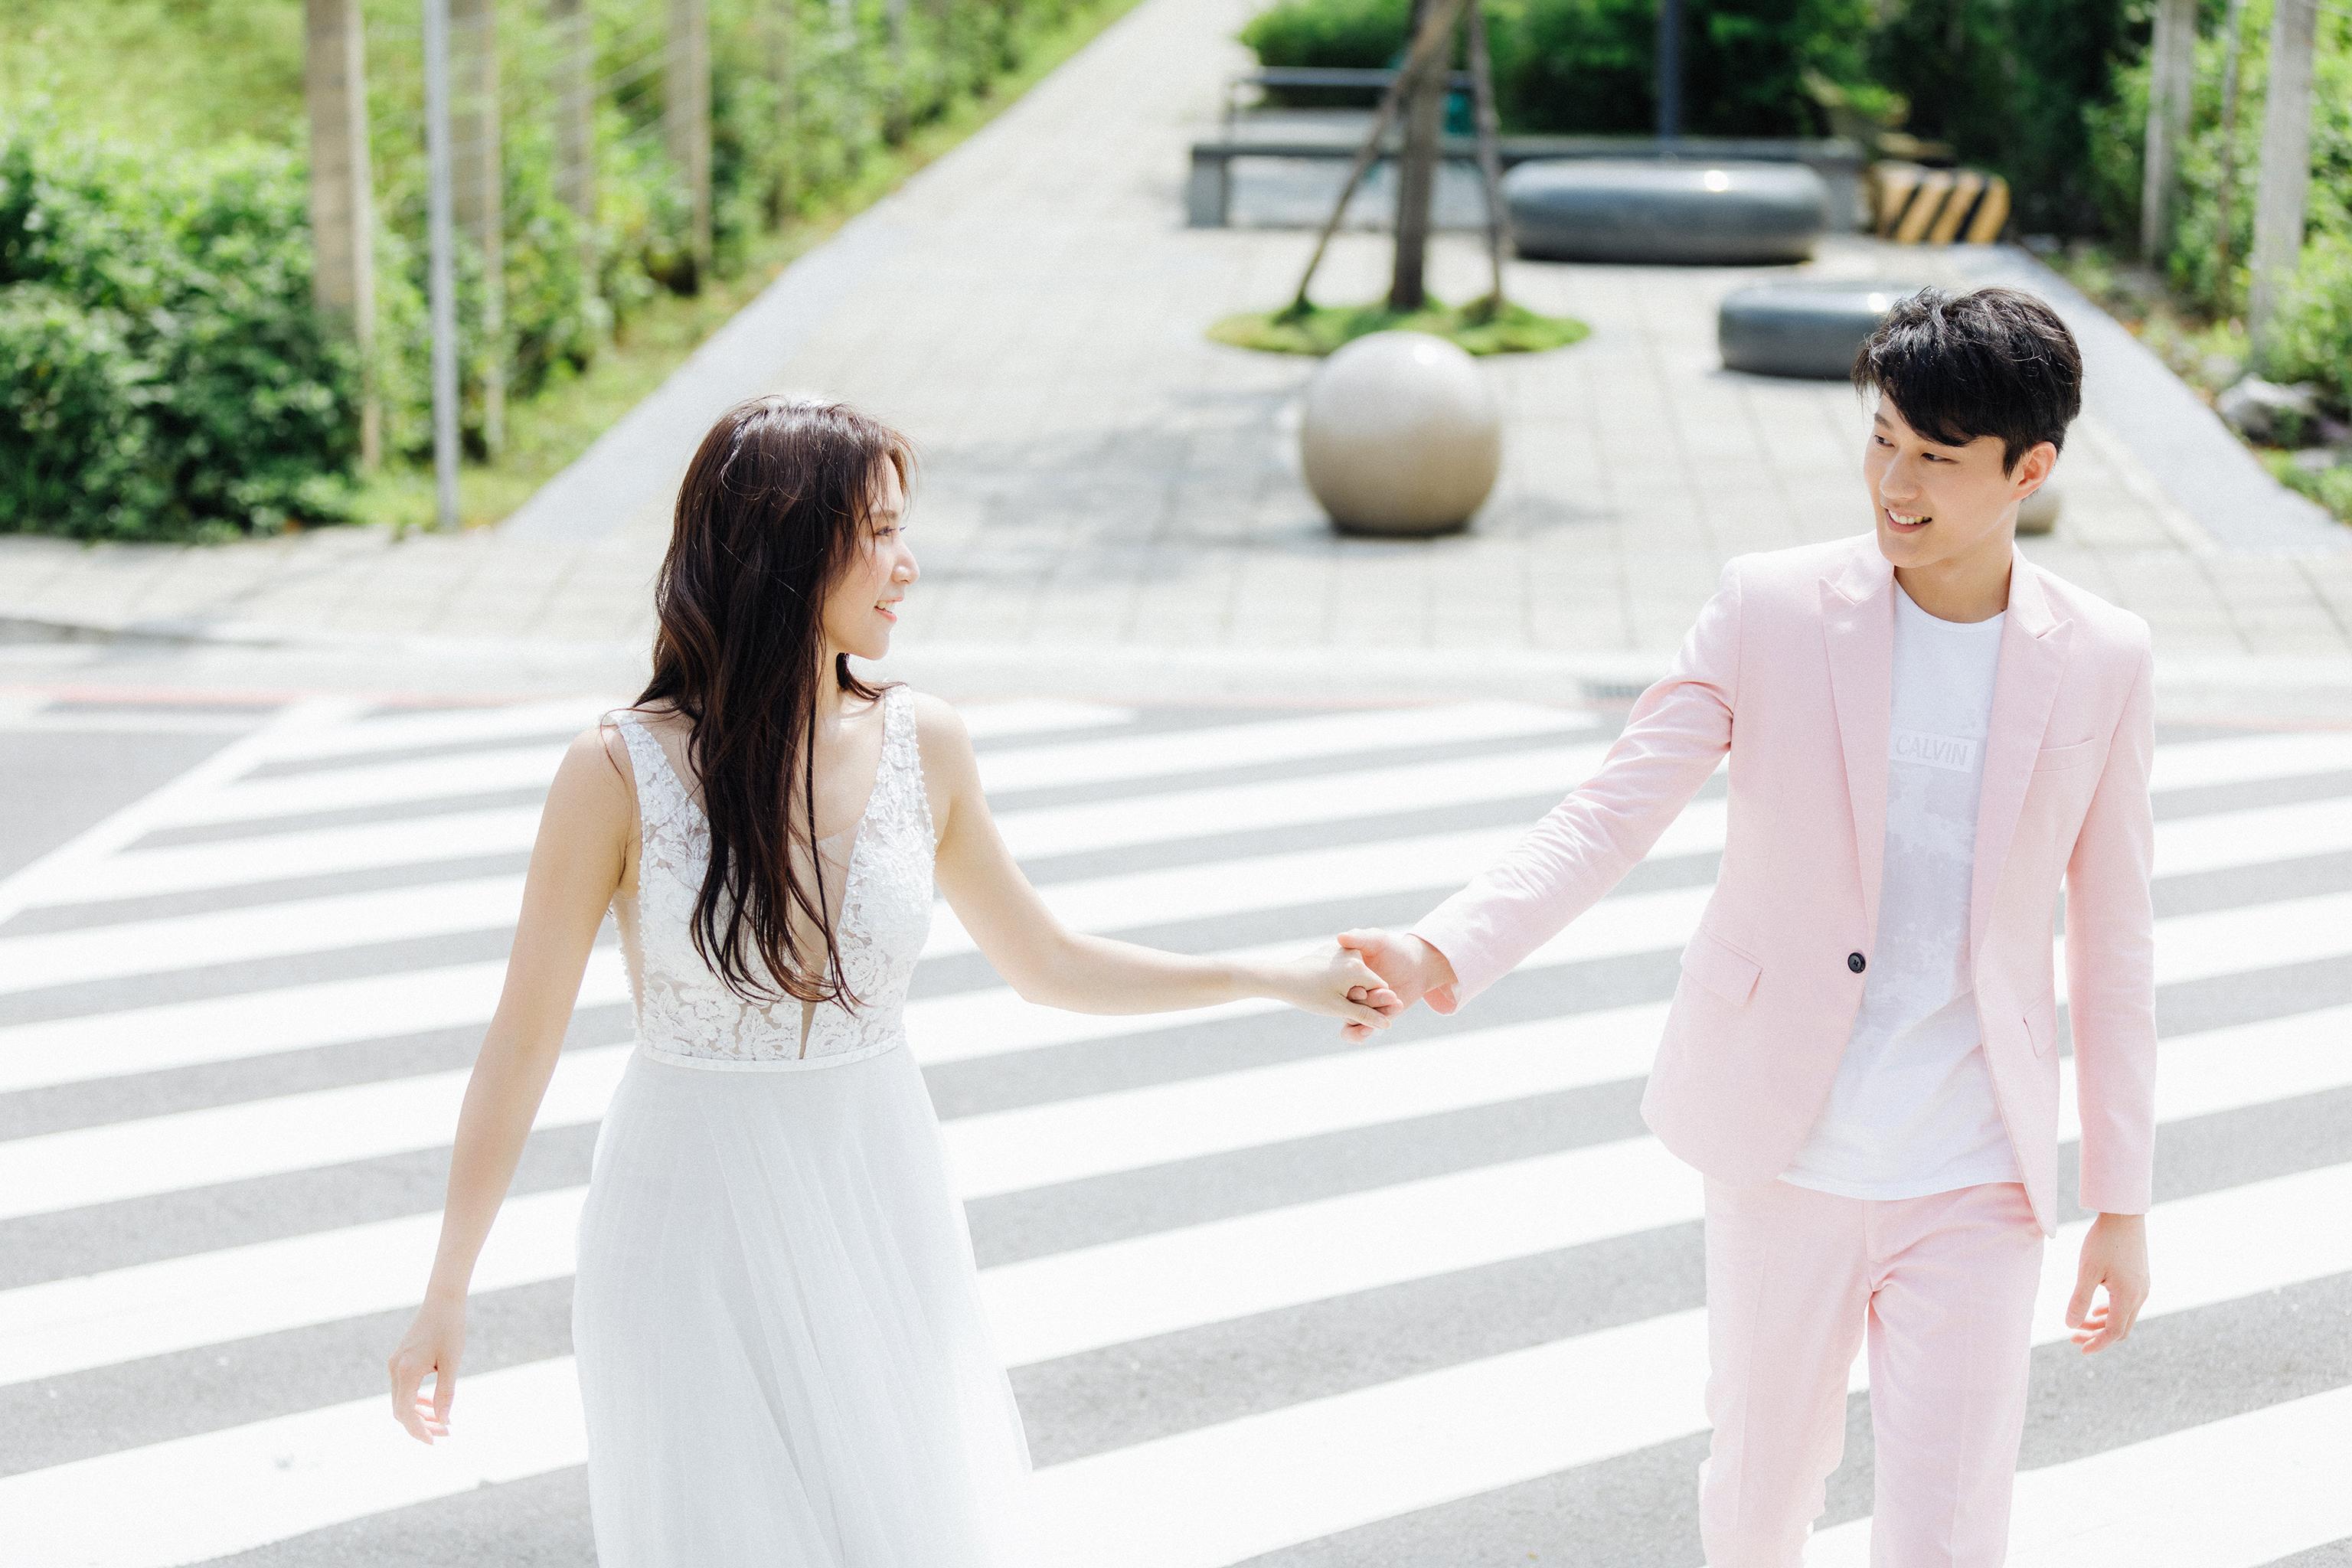 48592198341 b5d2f10382 o - 【自主婚紗】+Ying&Wiwi+